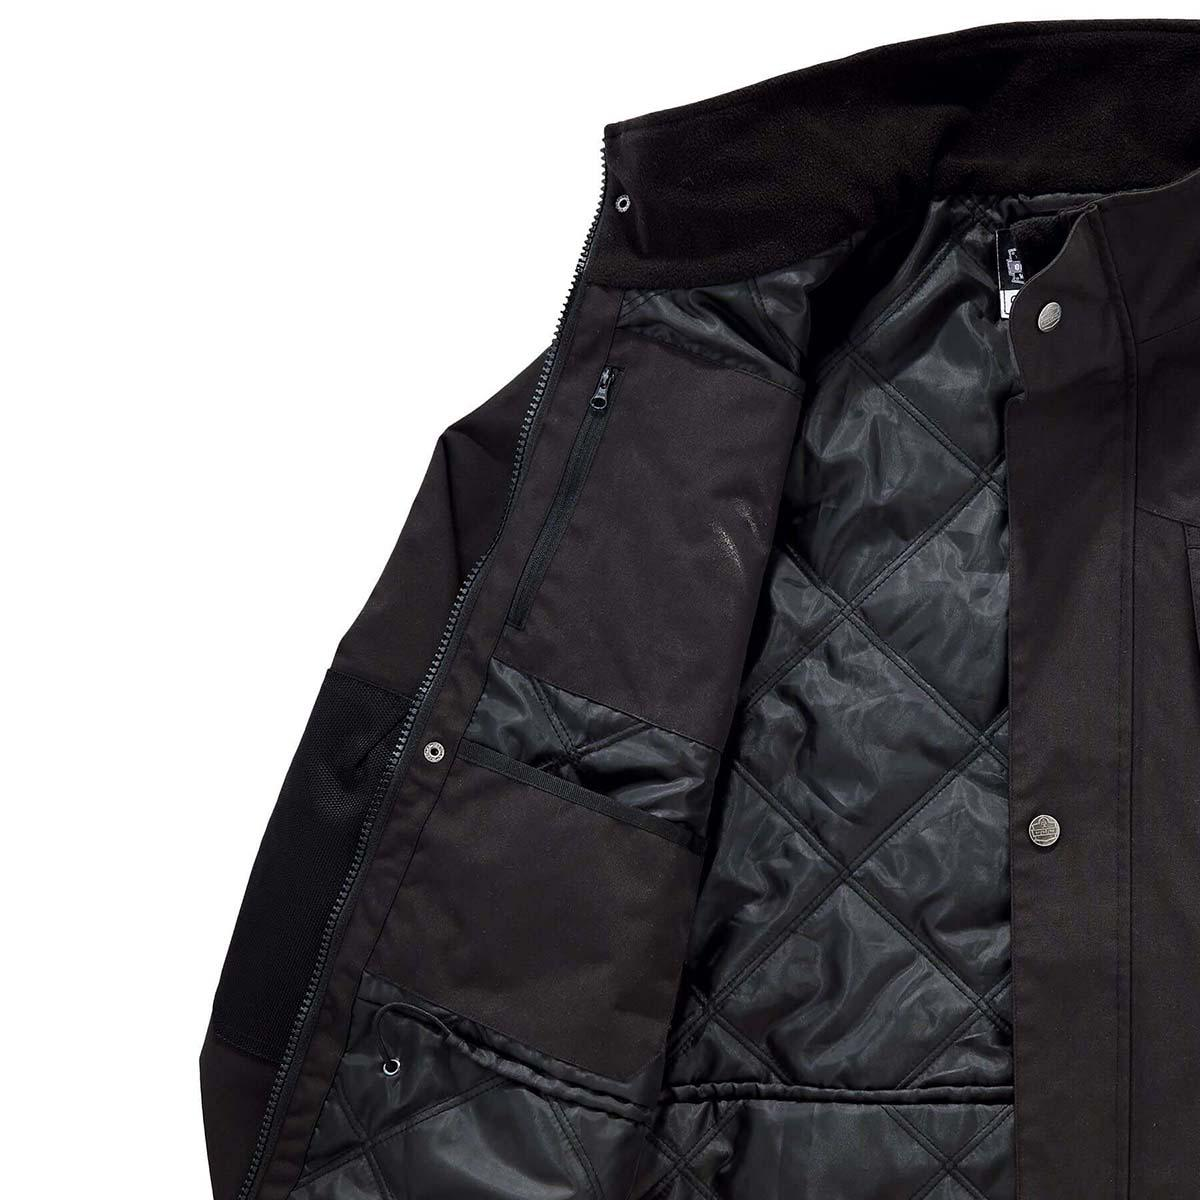 6466 L Black Thermal Jacket